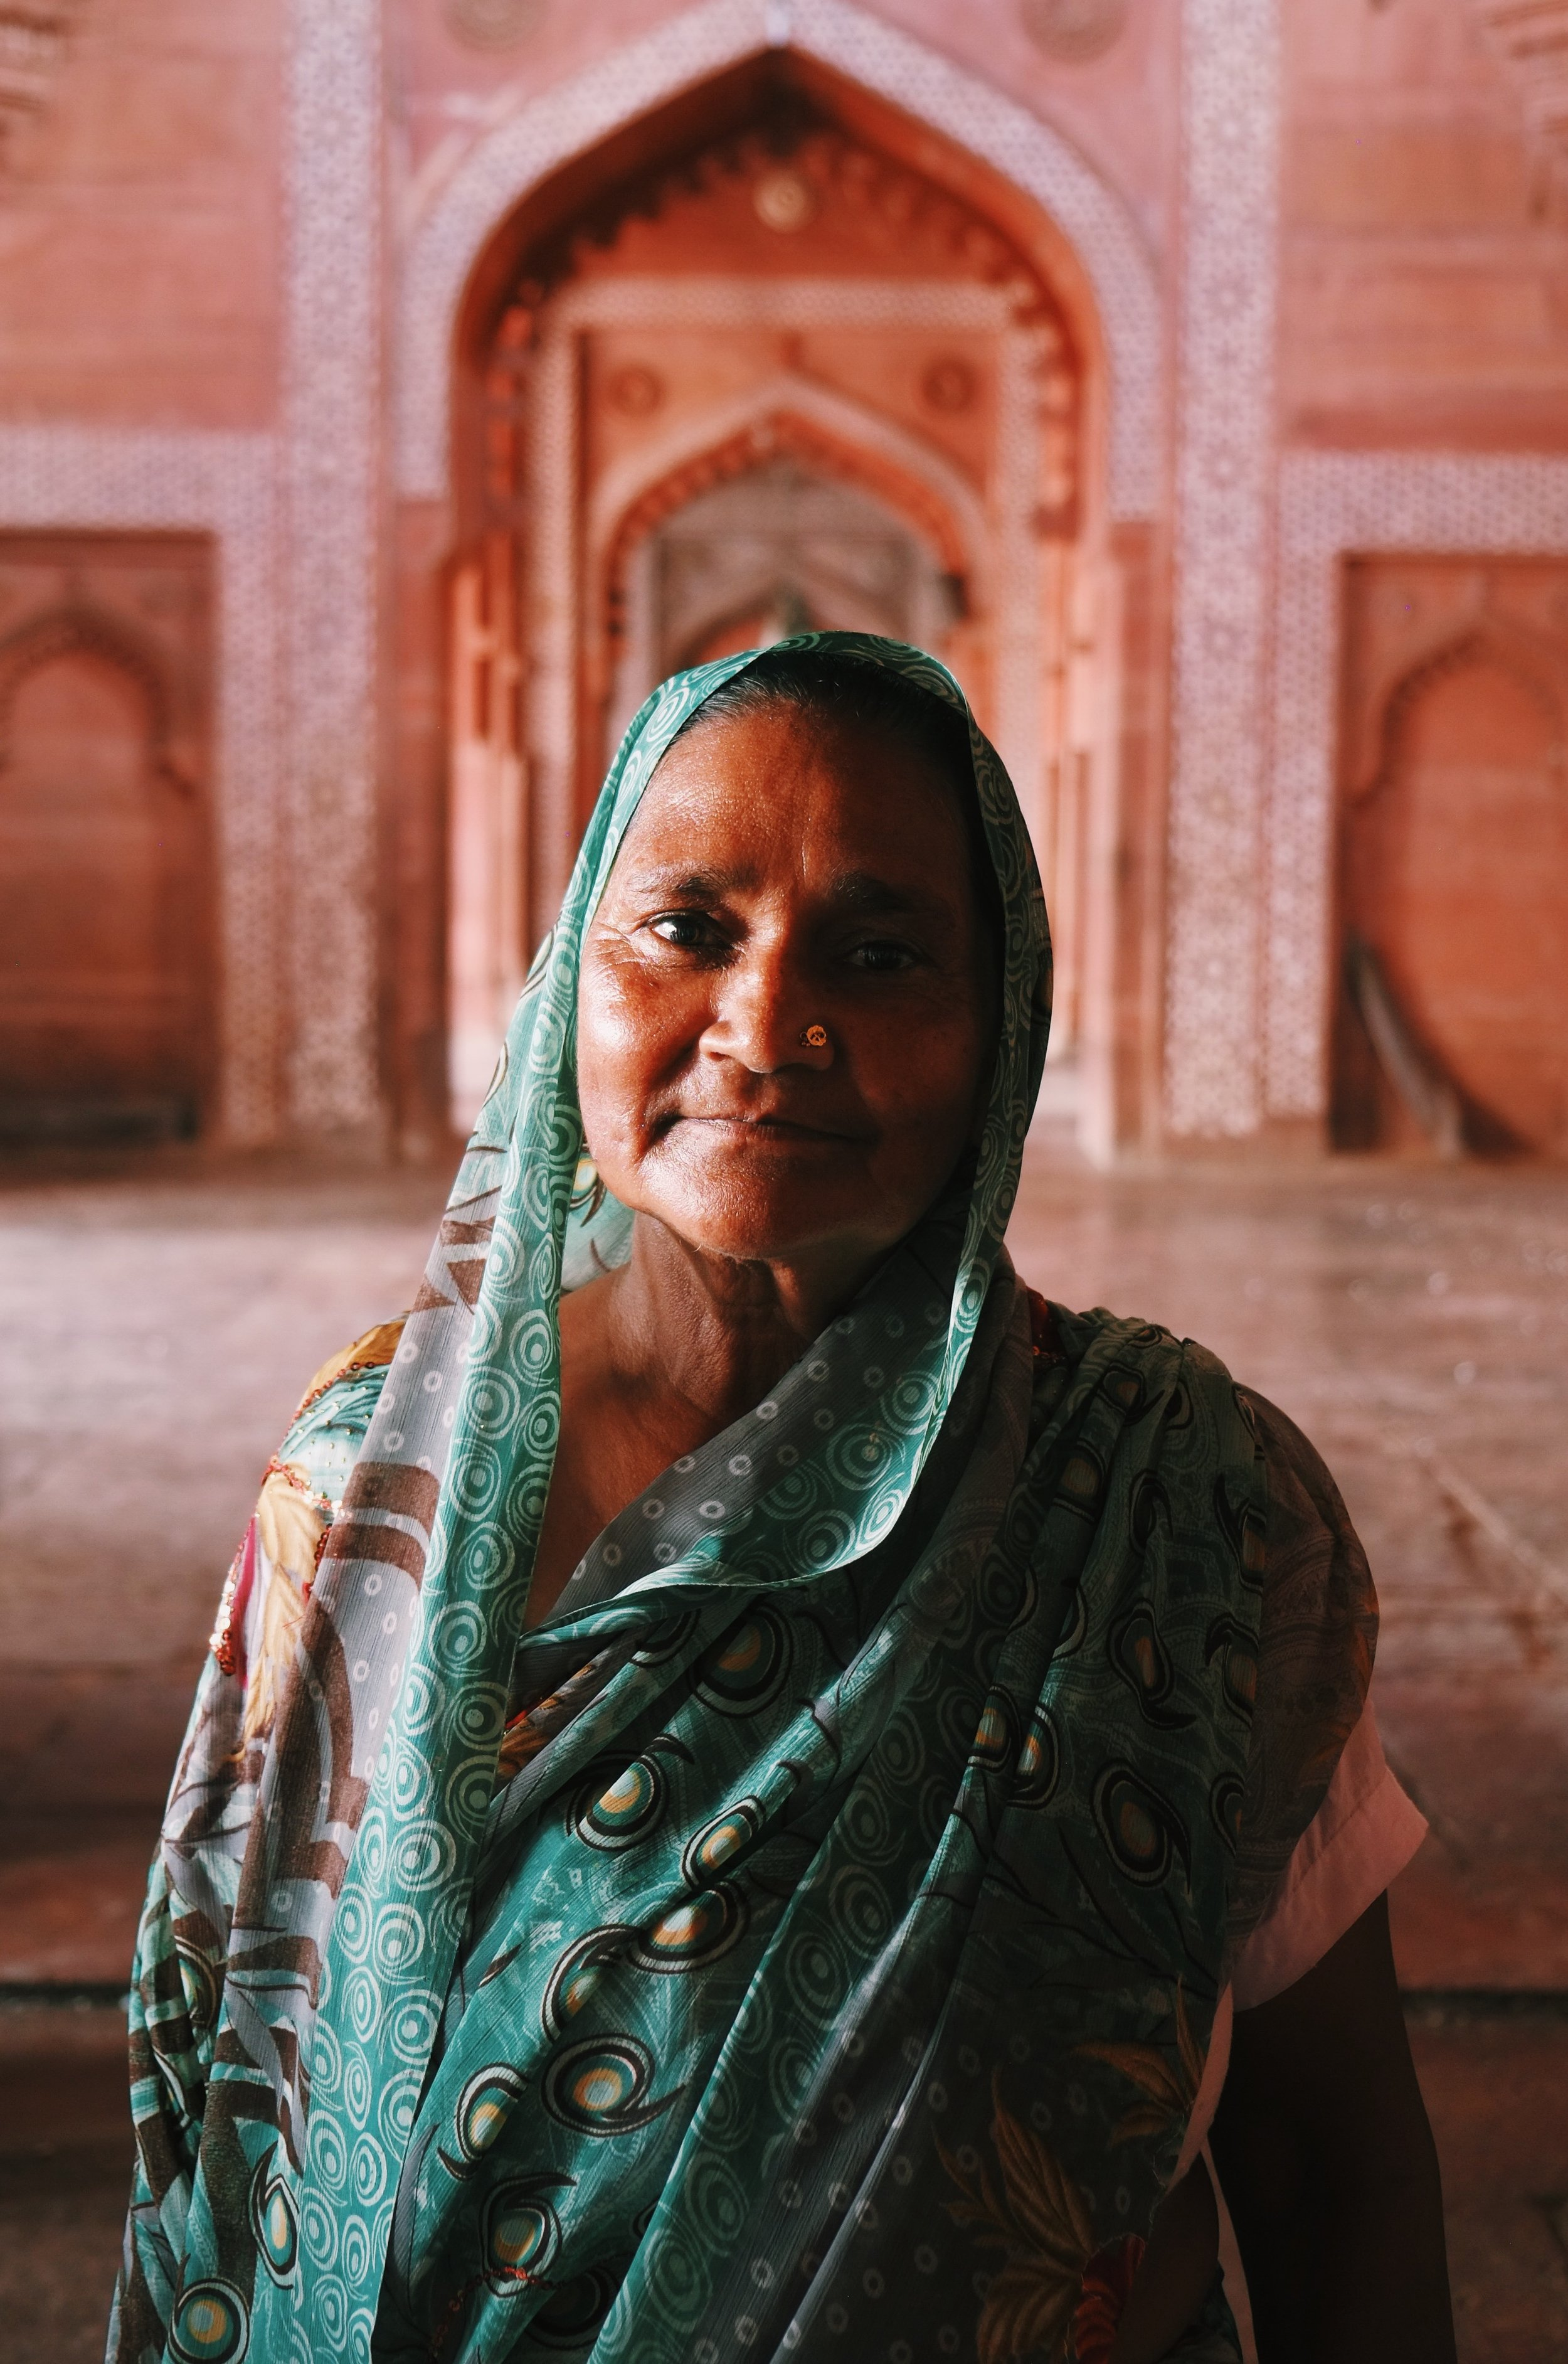 Lady Fatehpur Sikri India Joost Bastmeijer.jpeg